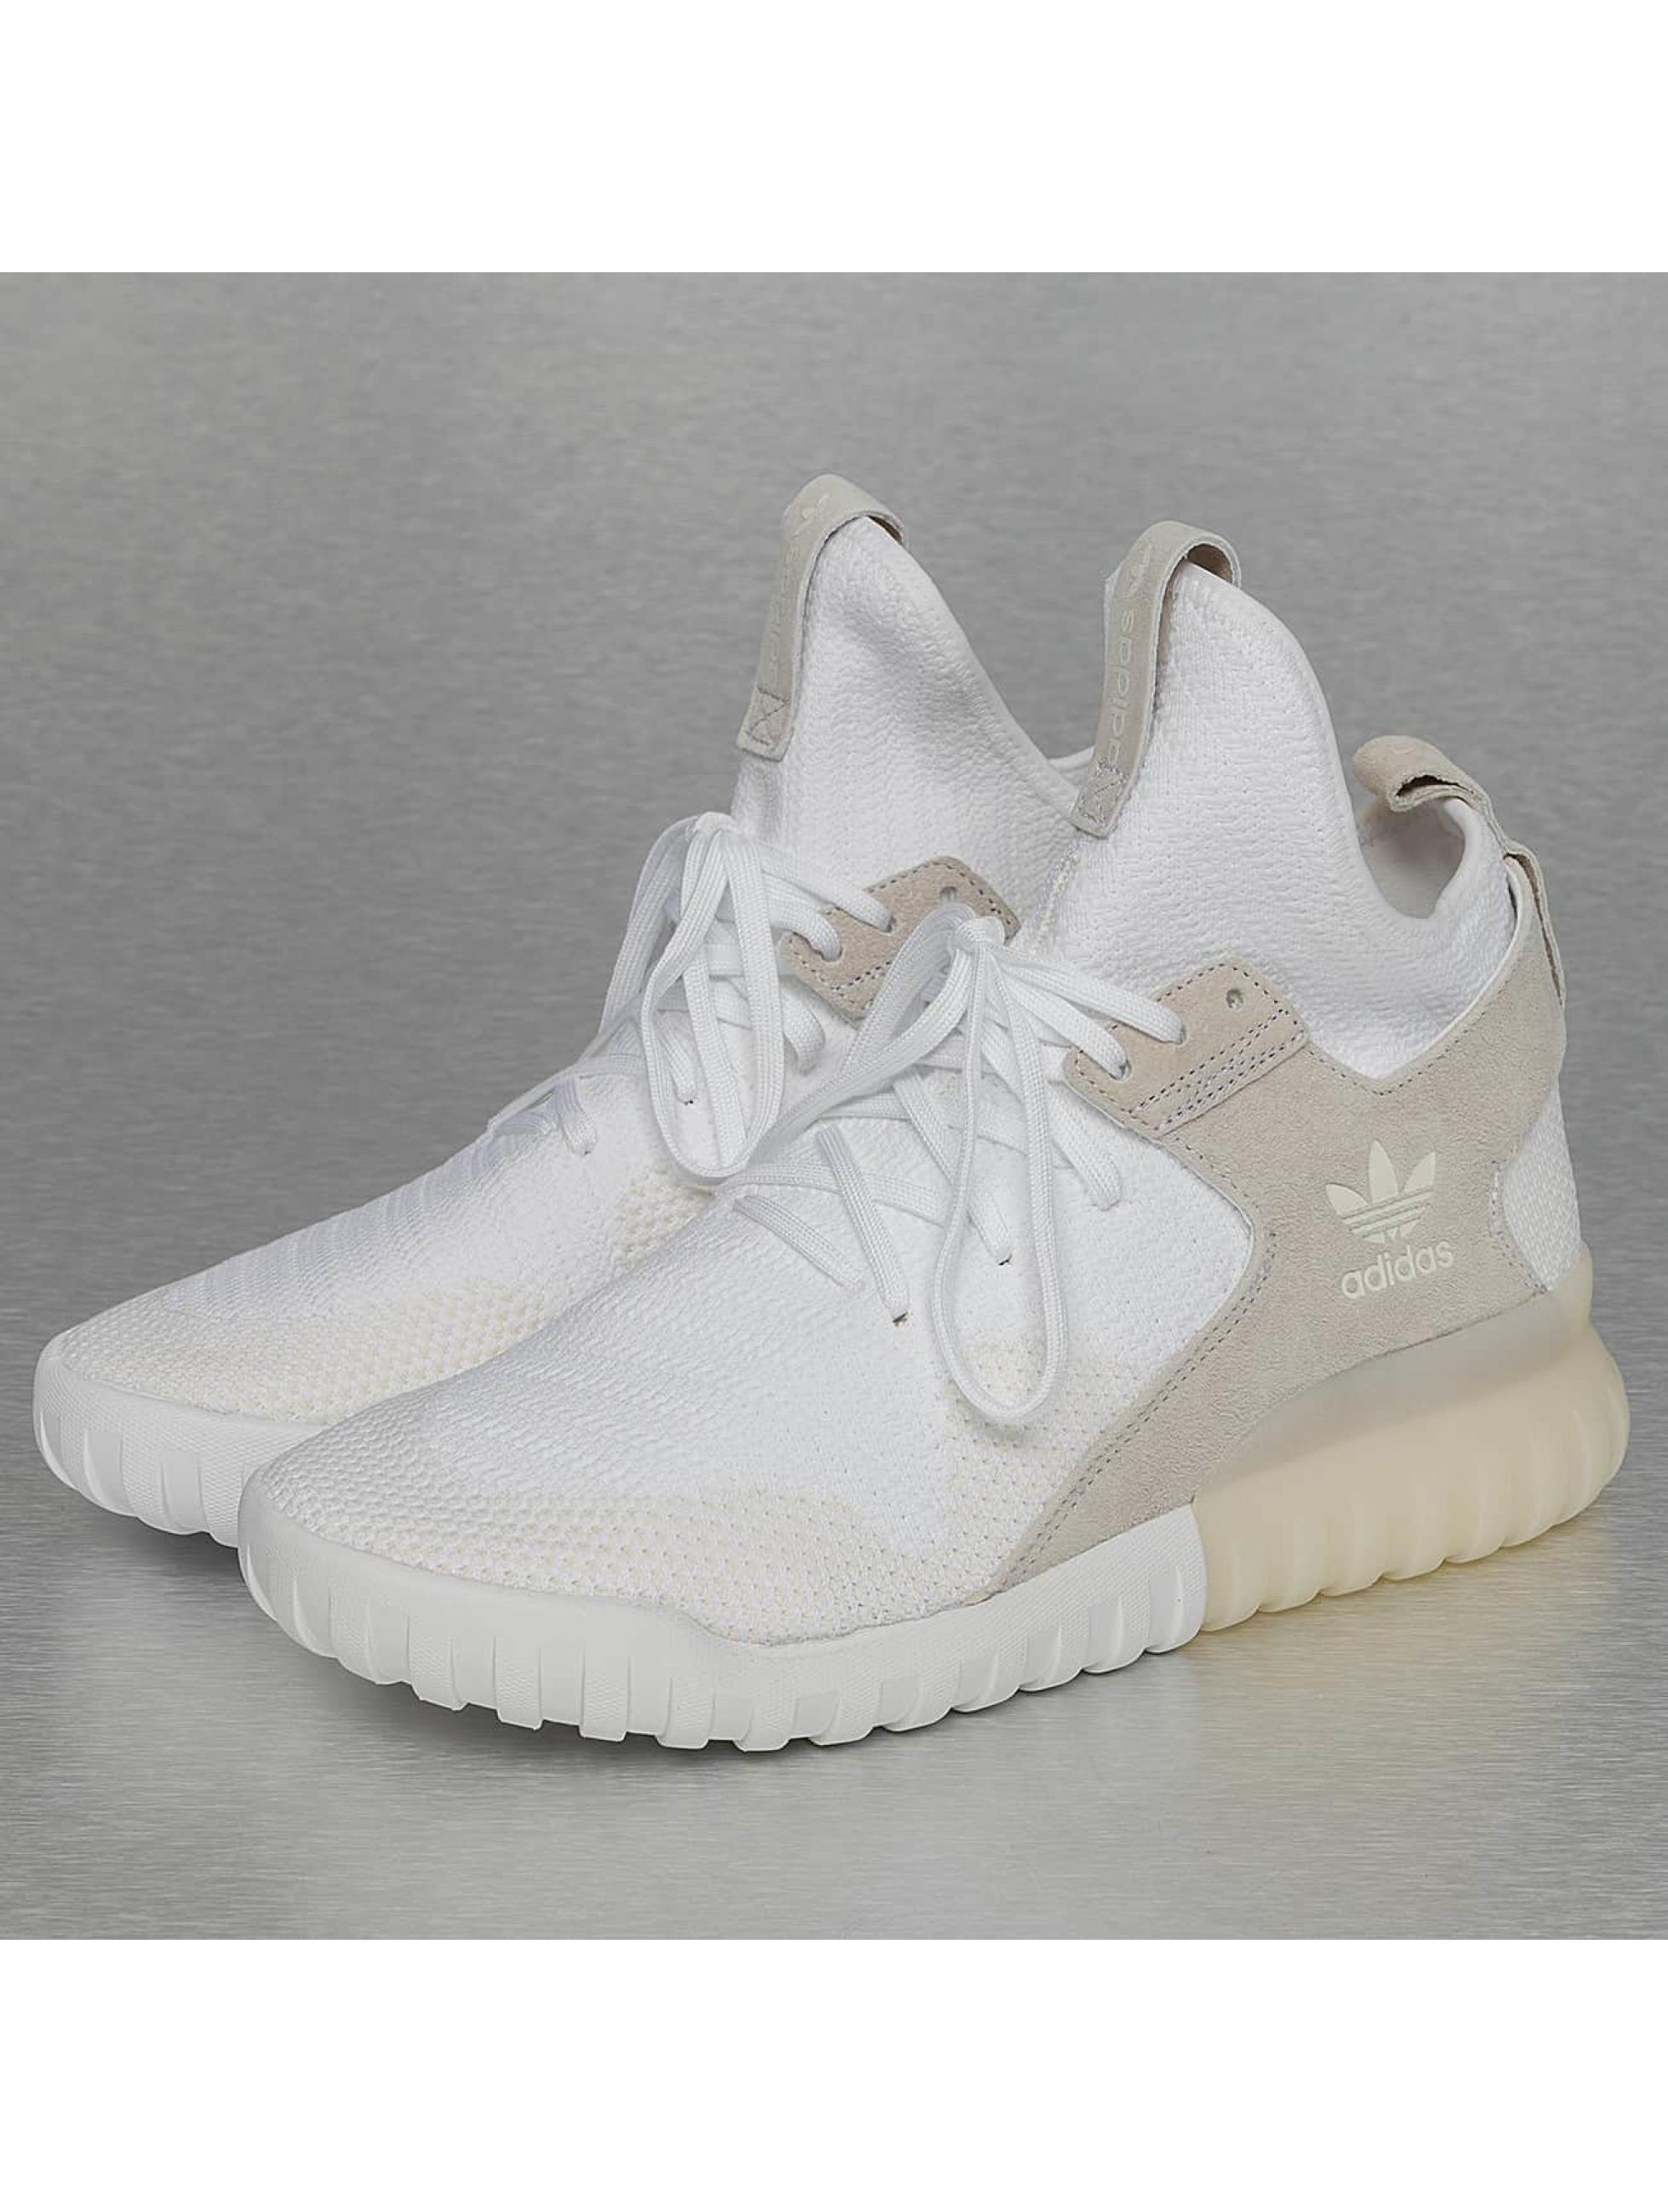 Sneaker Tubular X Primeknit in weiß